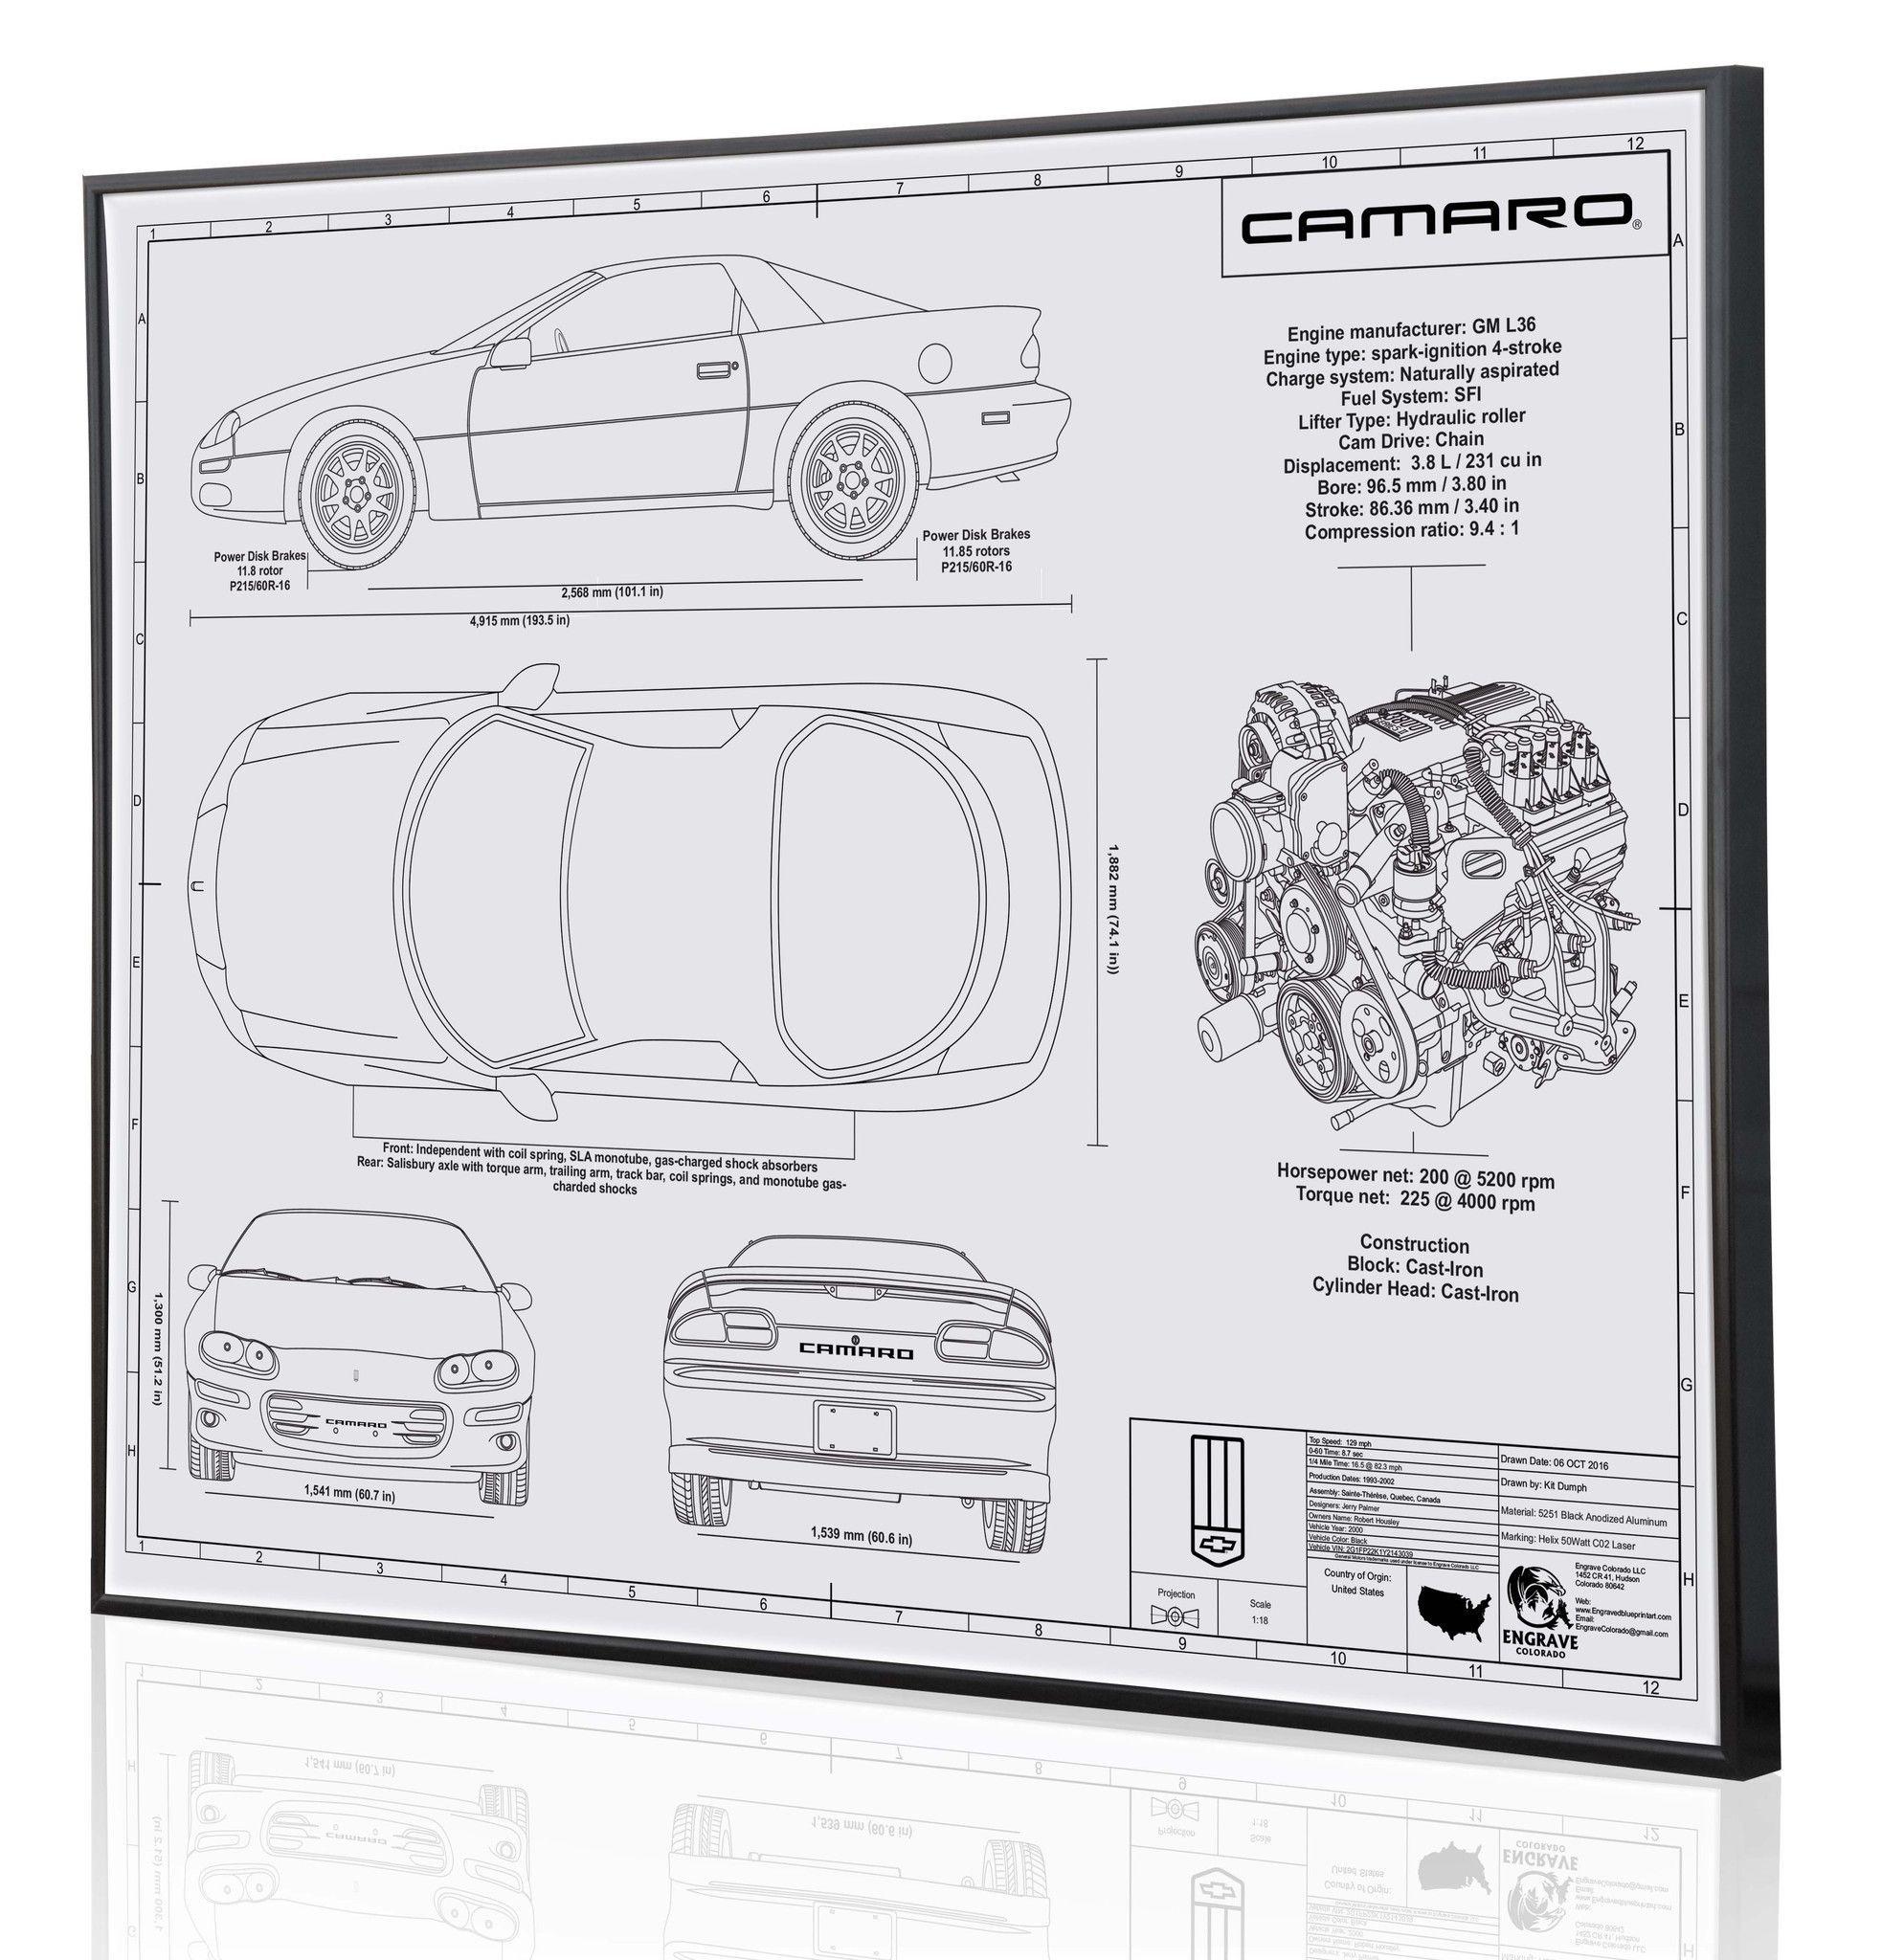 Chevrolet Camaro RS (4th Generation)